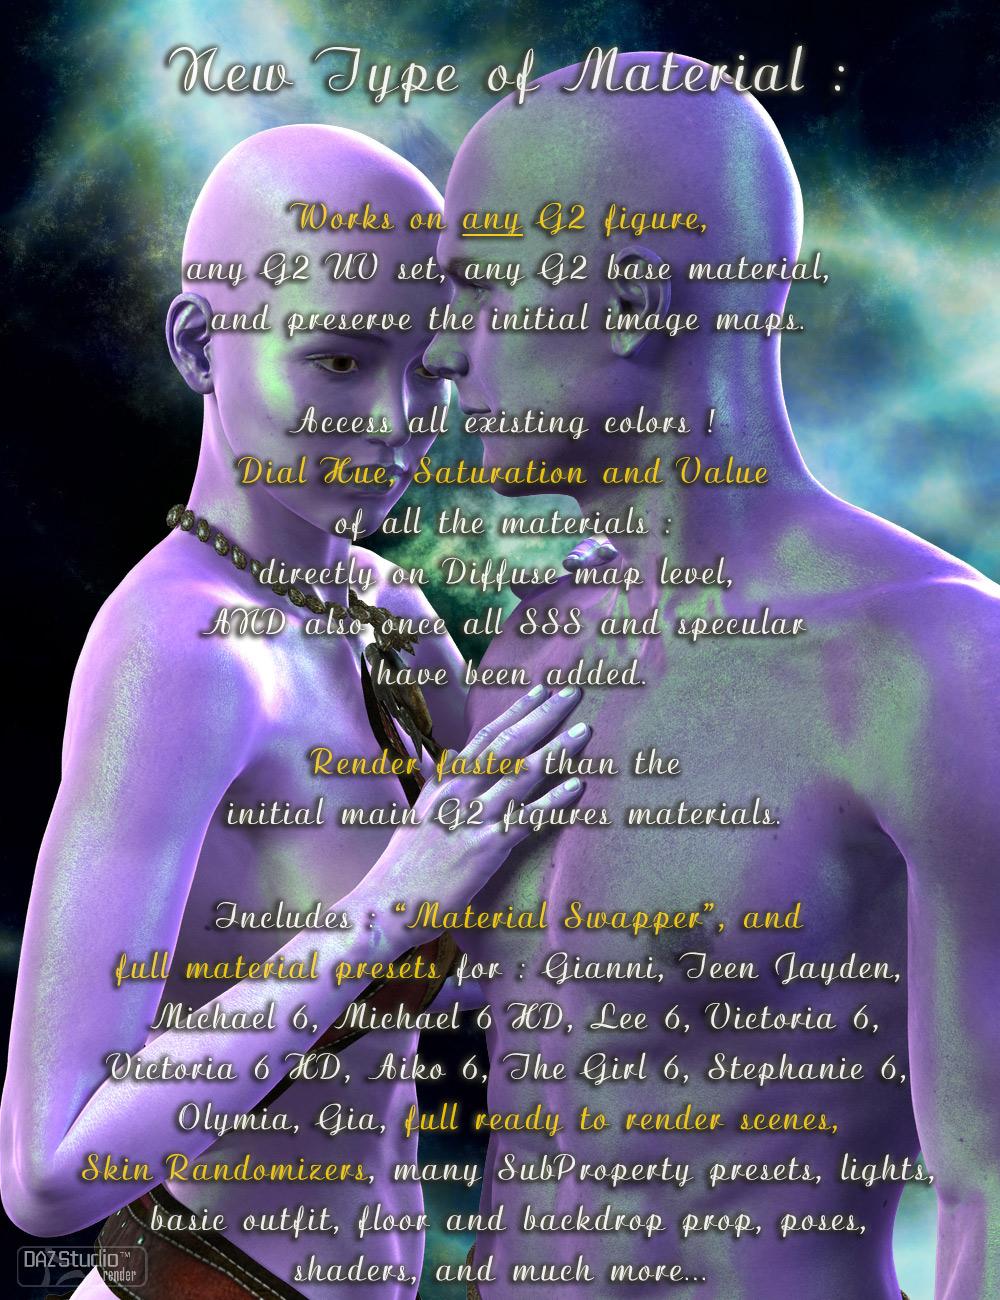 Amazing Skins For Genesis 2 Bundle by: V3Digitimes, 3D Models by Daz 3D